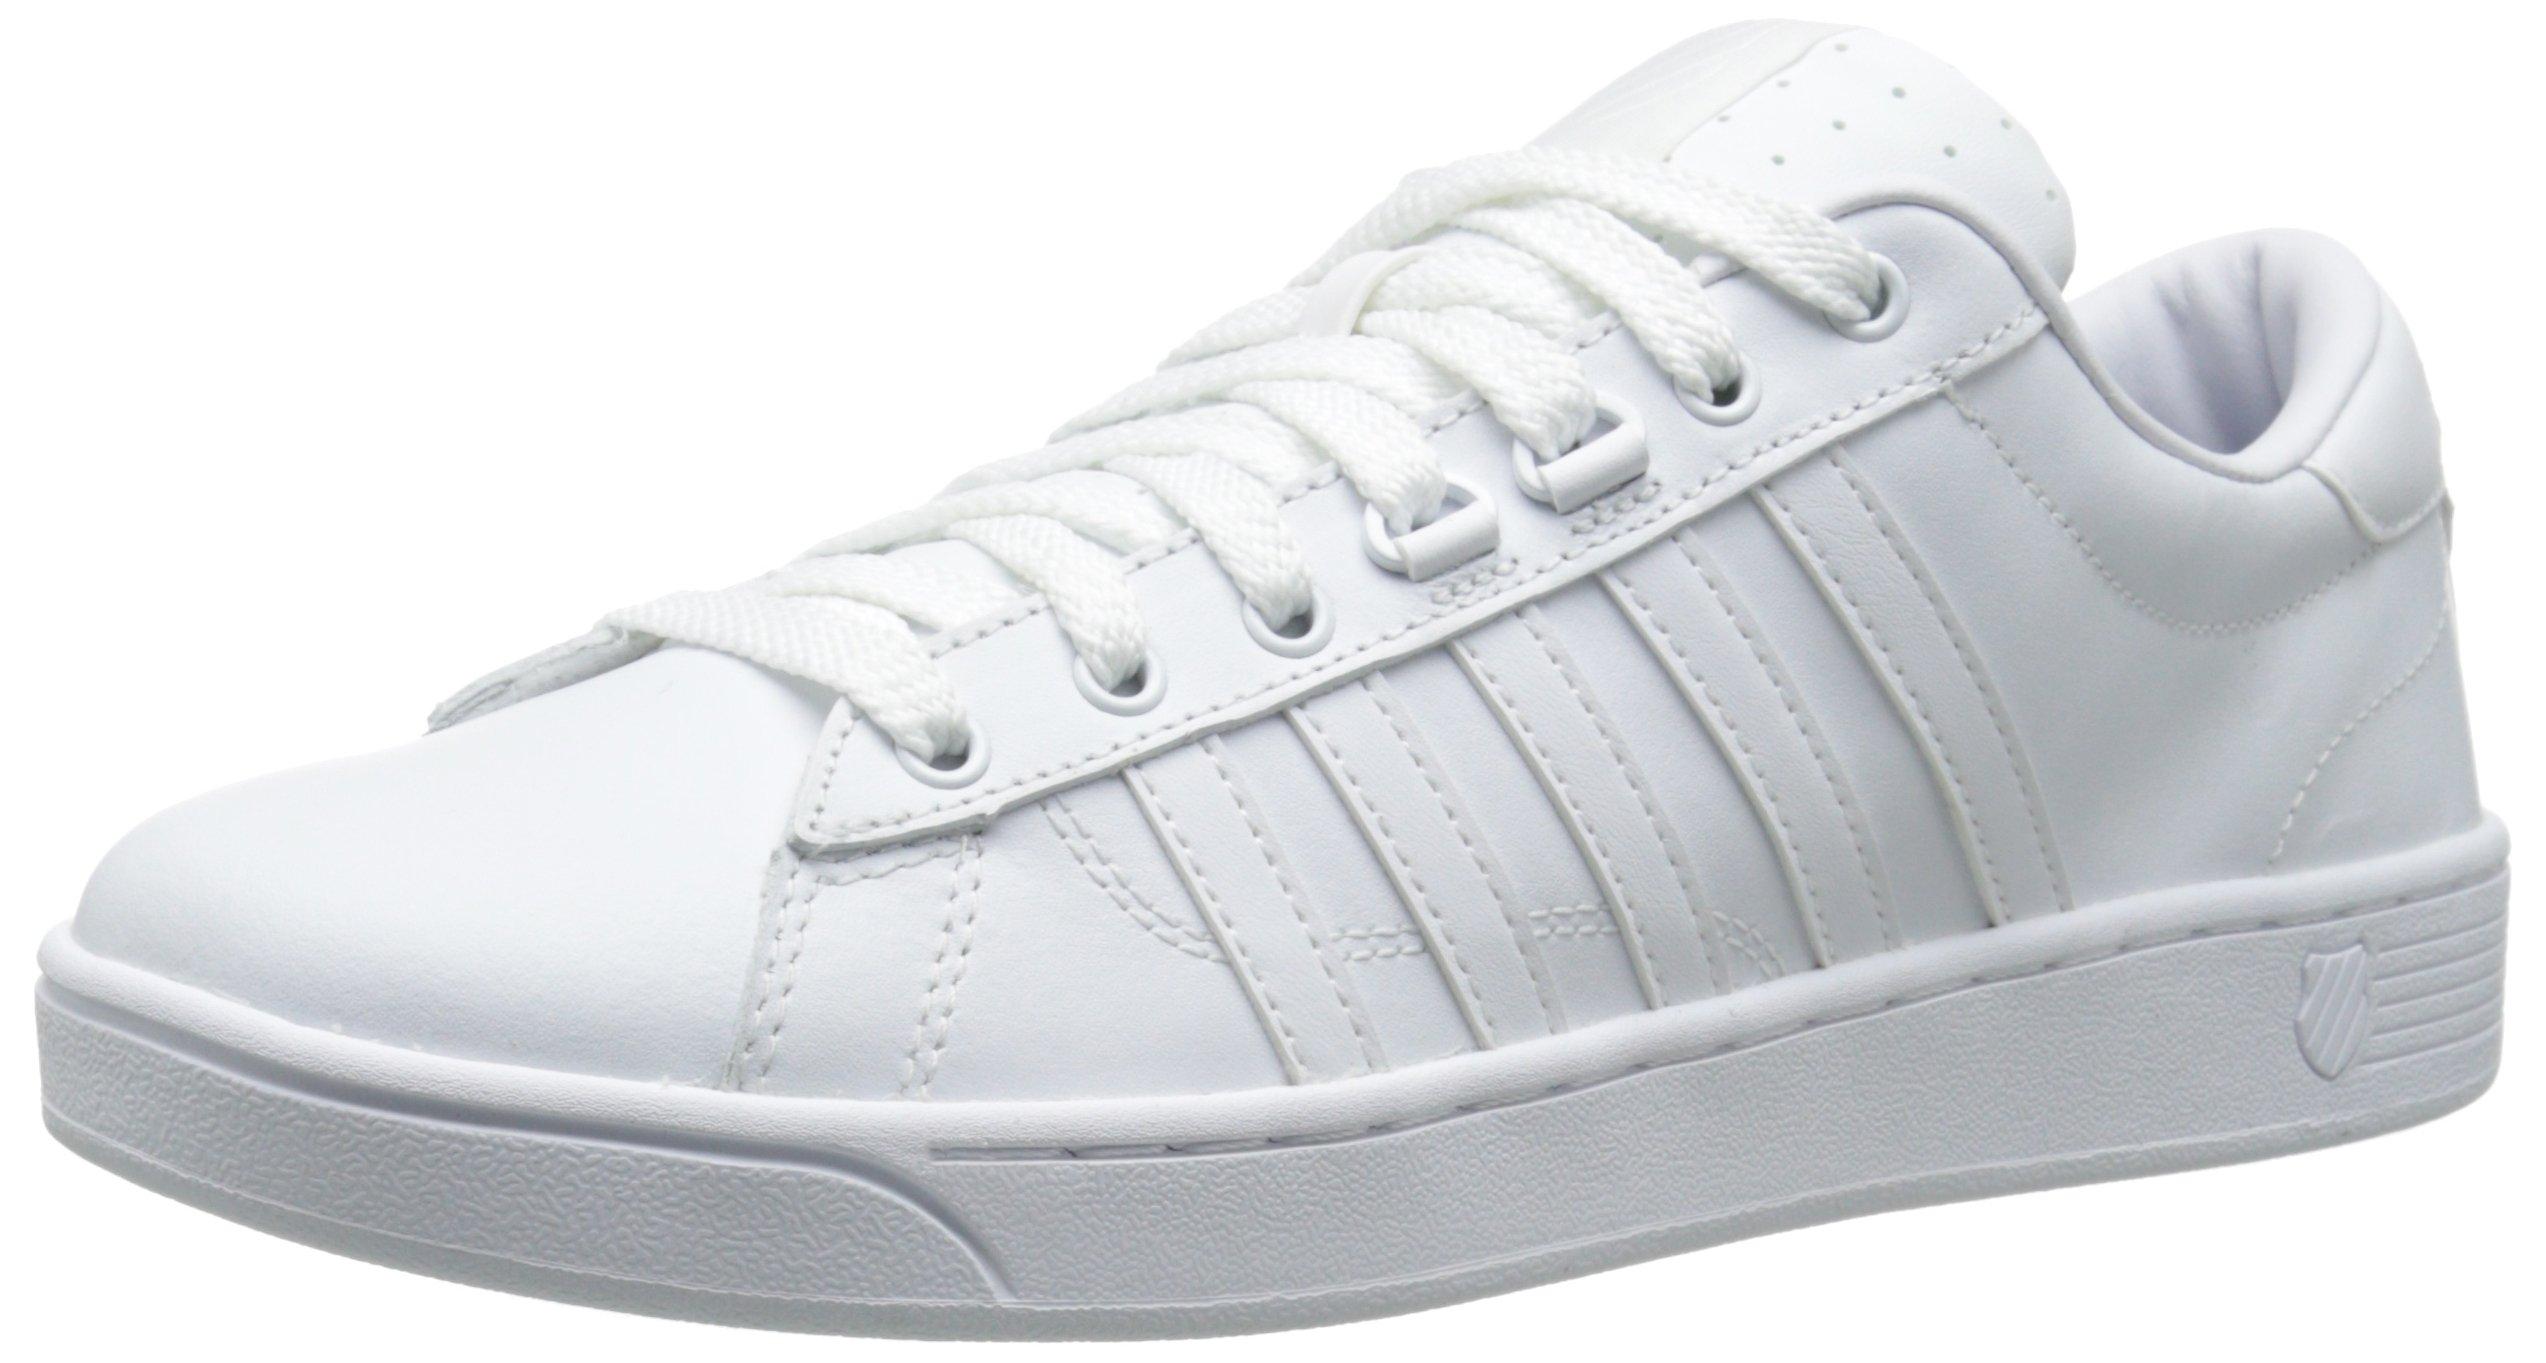 K-Swiss Men's Hoke CMF Shoe, White/White, 8.5 M US by K-Swiss